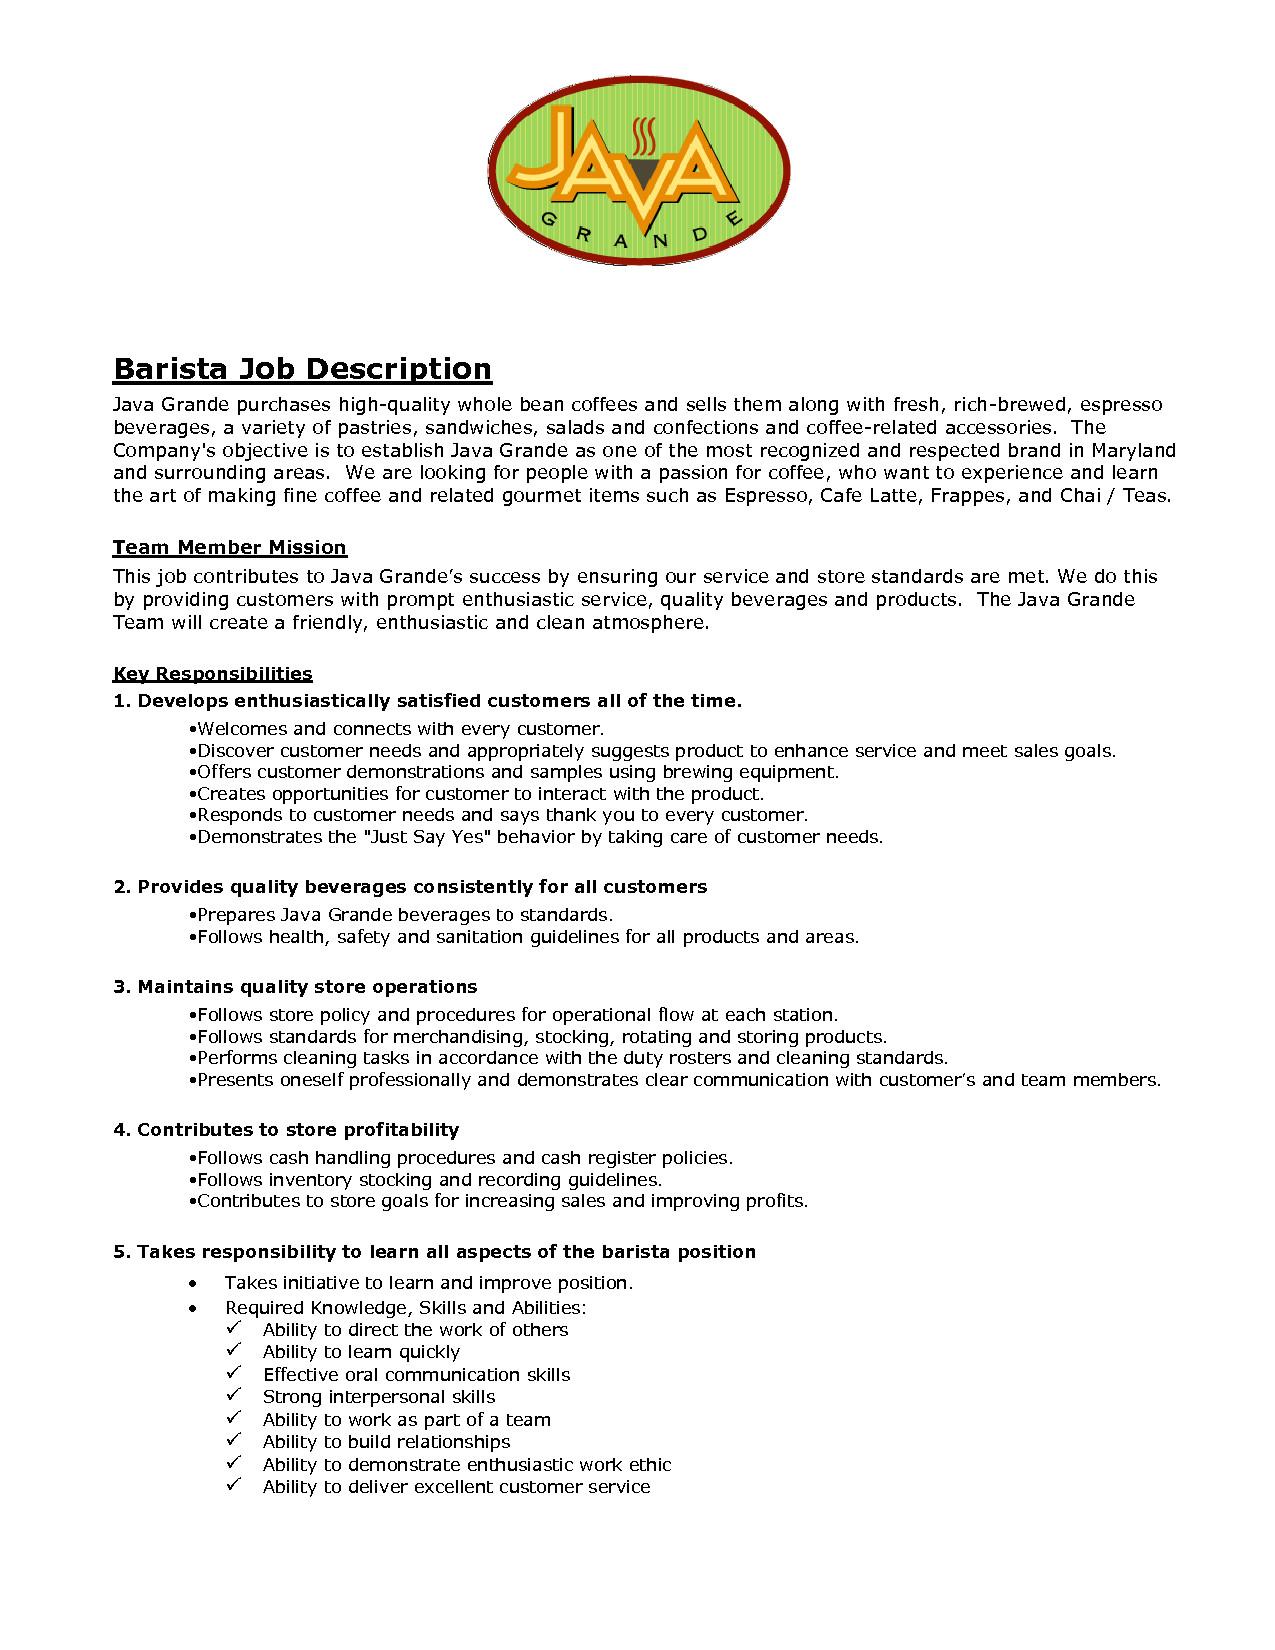 Sample Resume for Barista Position Barista Job Description Resume Samples